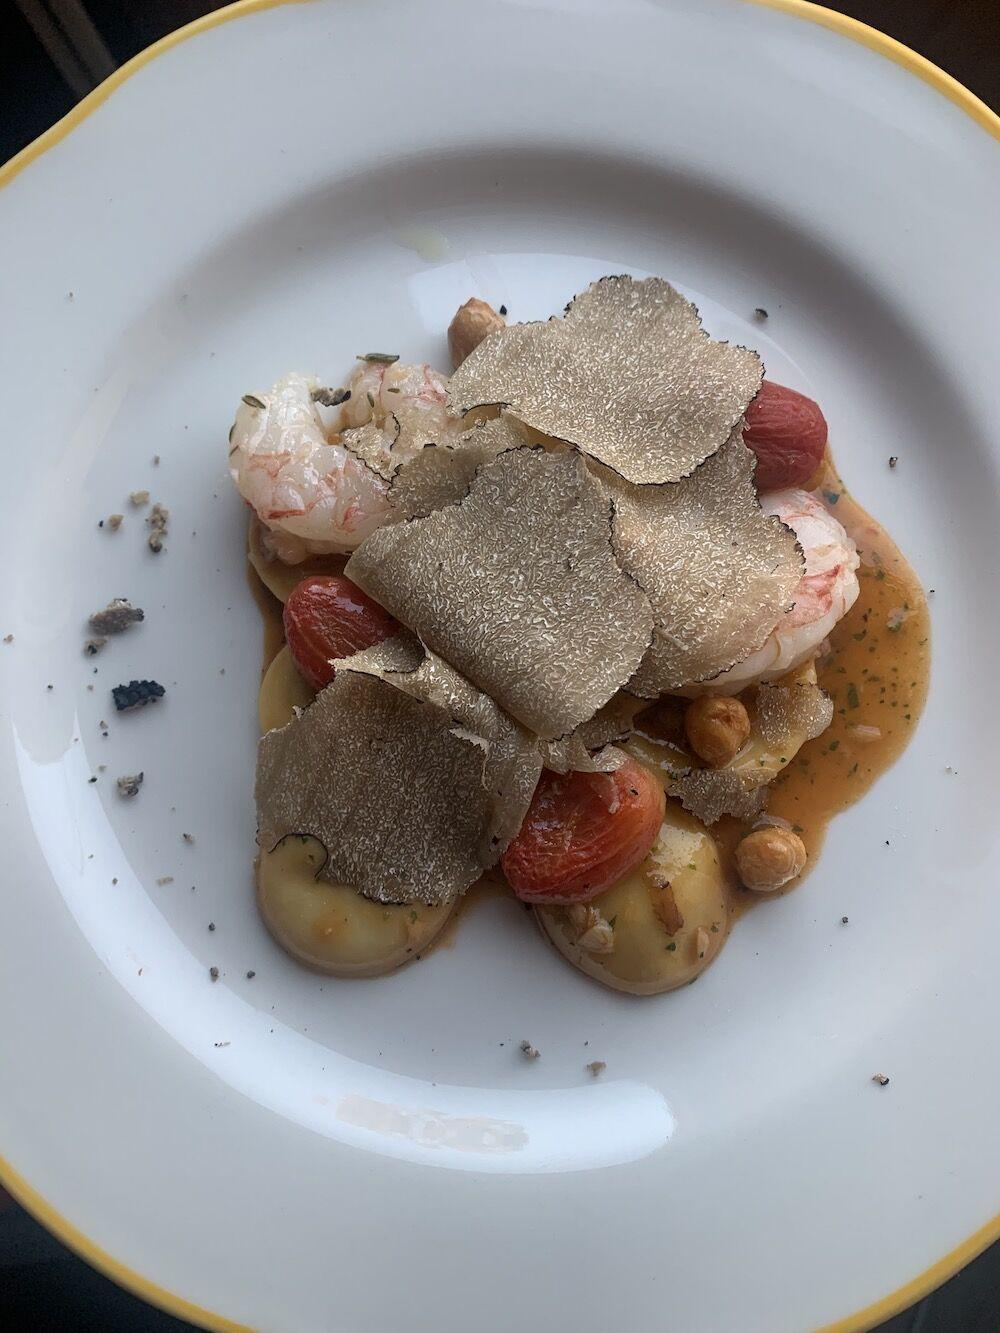 3 Dishes - ravioli